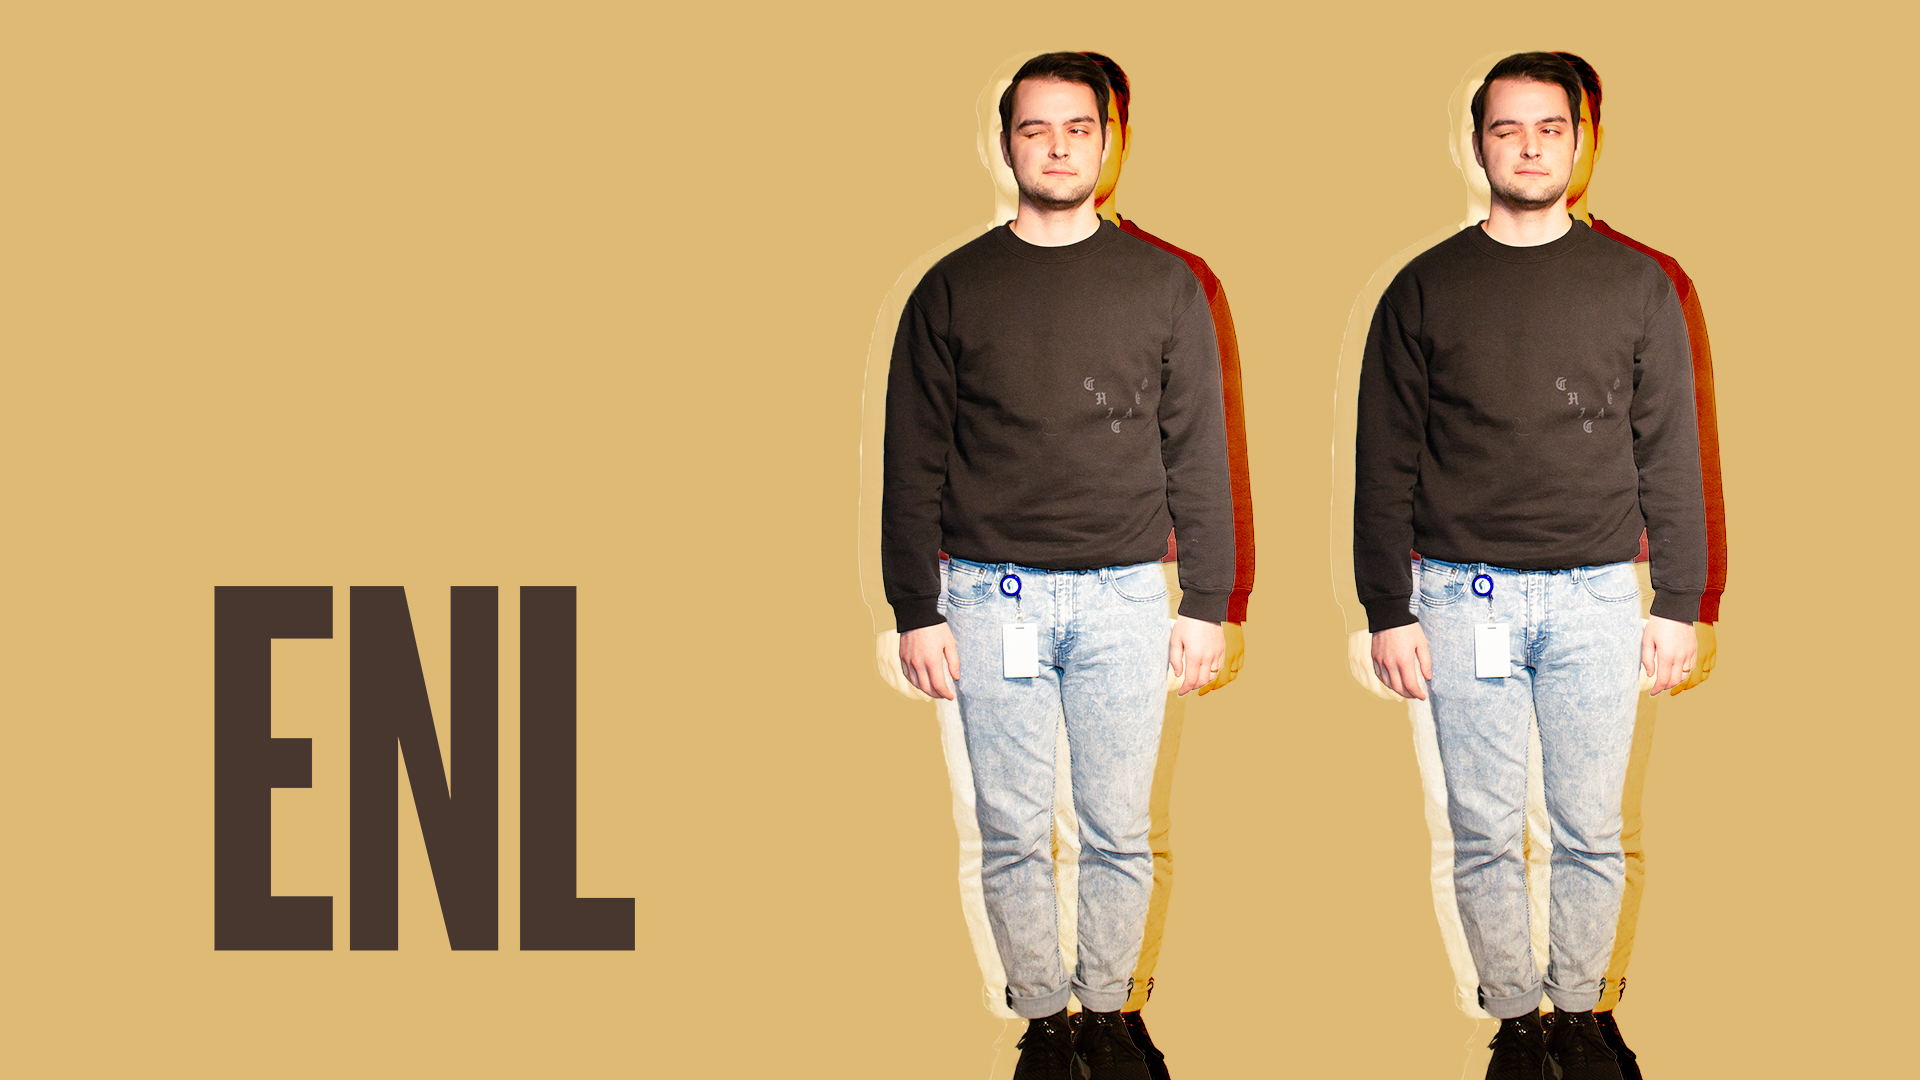 ENL_21.jpg